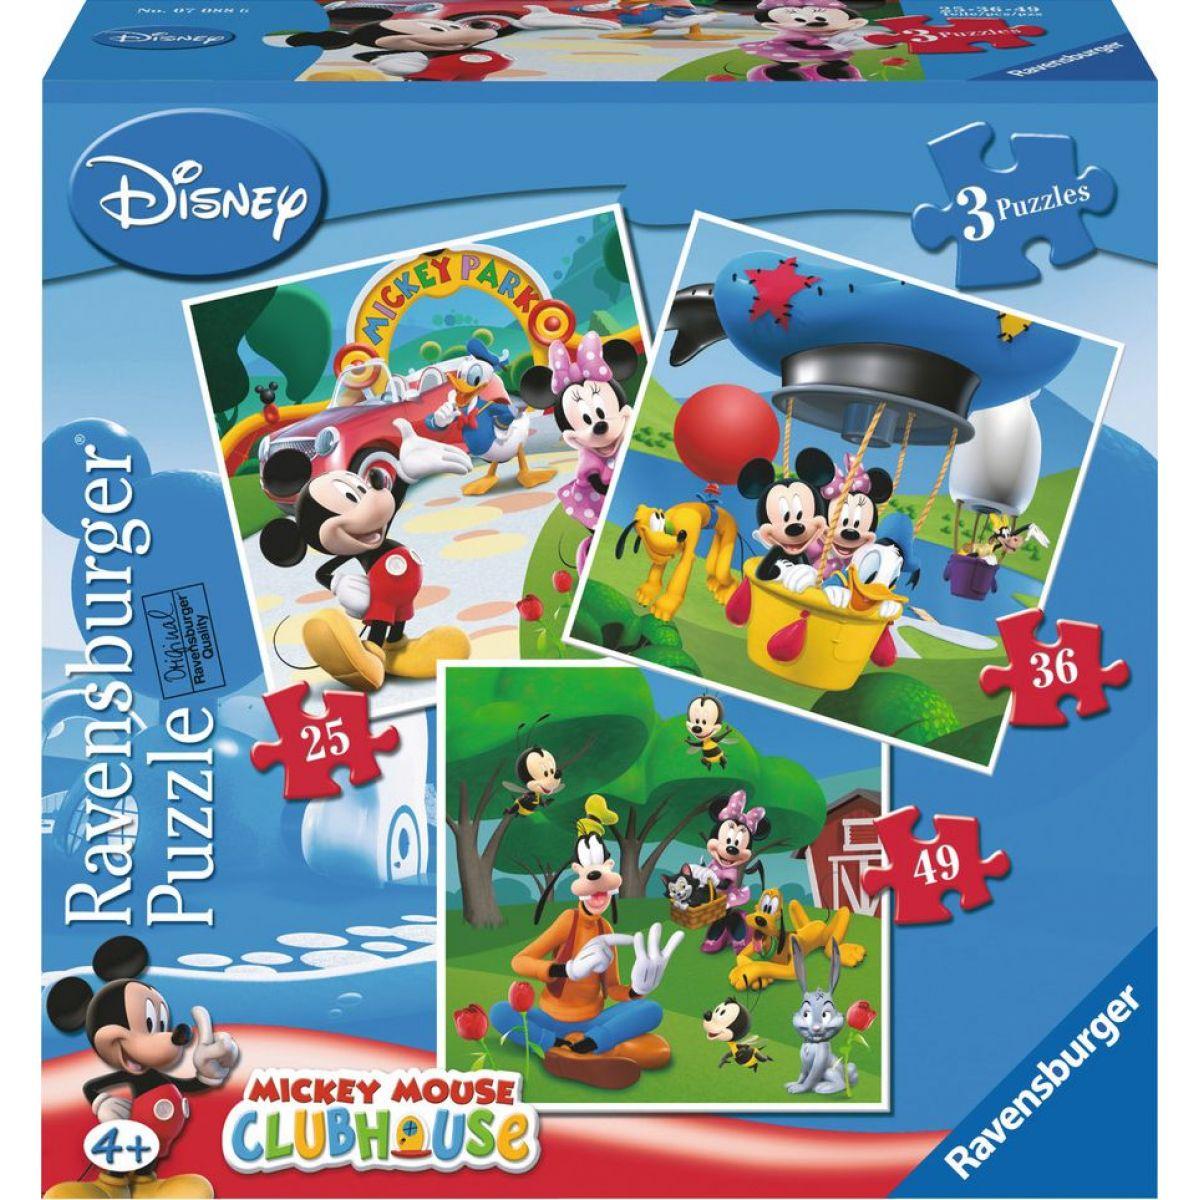 Ravensburger Disney Mickey v Parku puzzle 25 ,36, 49 dielikov